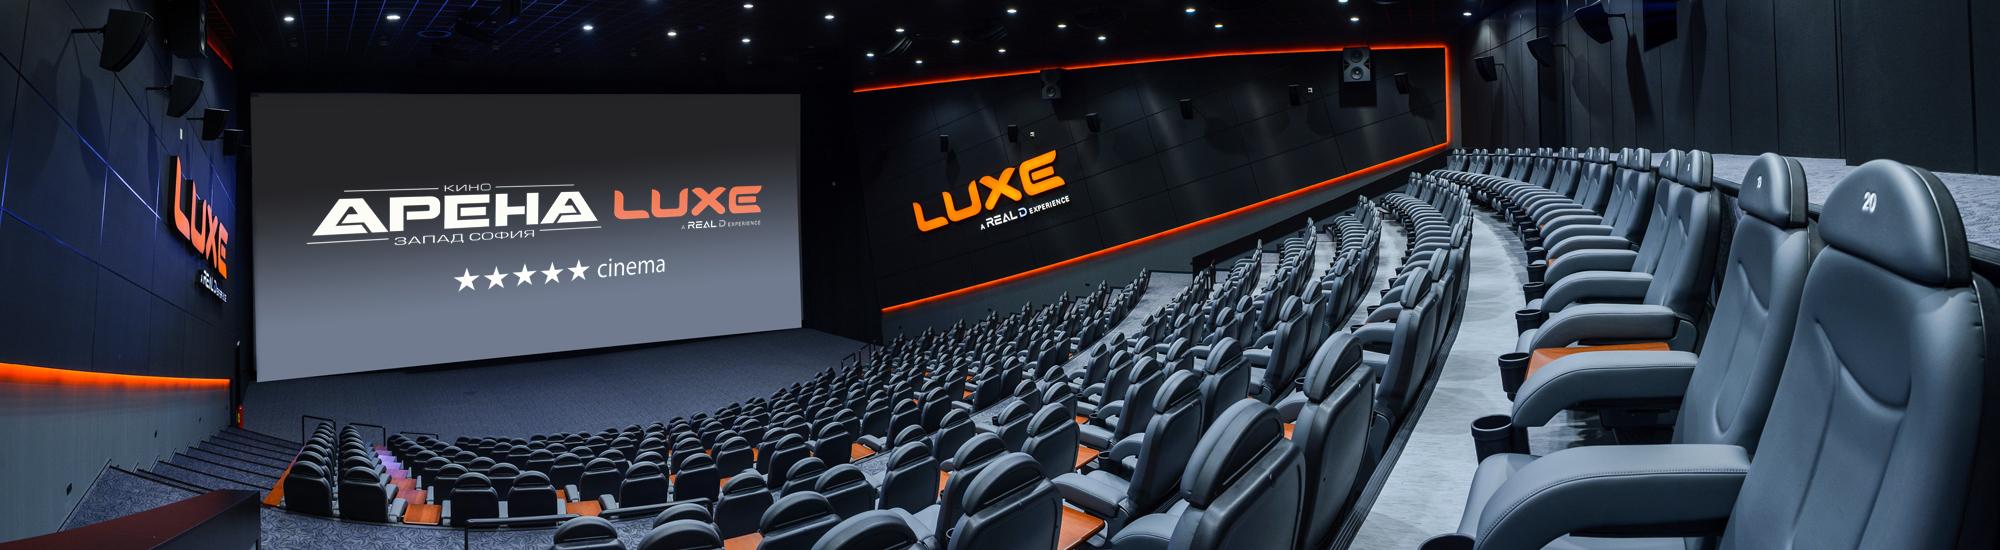 Movies Kino Arena Ltd